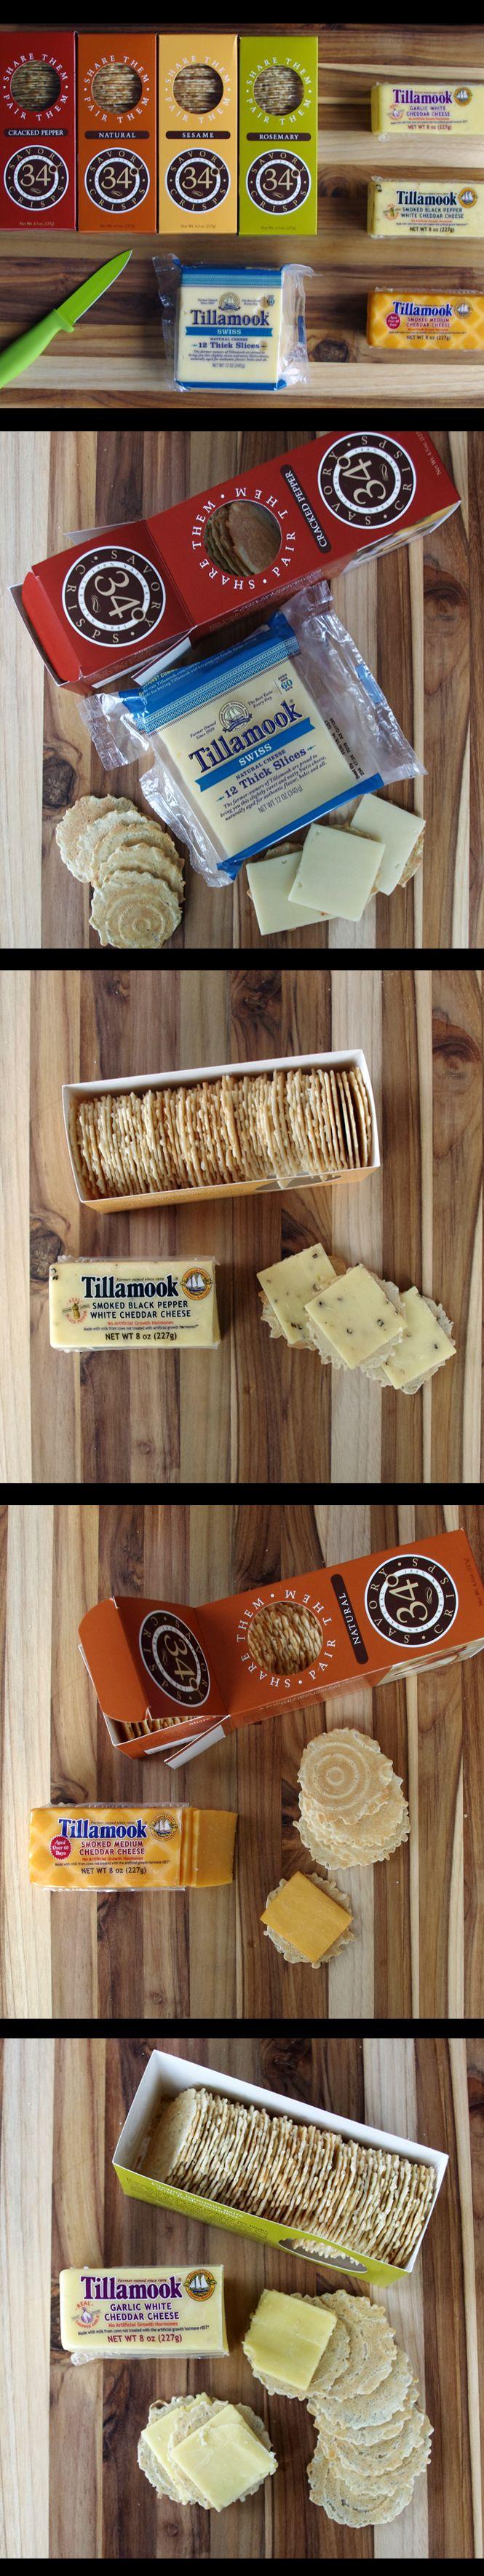 Cheese and cracker pairing guide! http://www.tillamook.com/community/loaflifeblog/tillamook-cheese-and-34o-crisps-pairing-guide/?utm_source=pinterest&utm_medium=social+media&utm_campaign=general @Tillamook and  Degrees